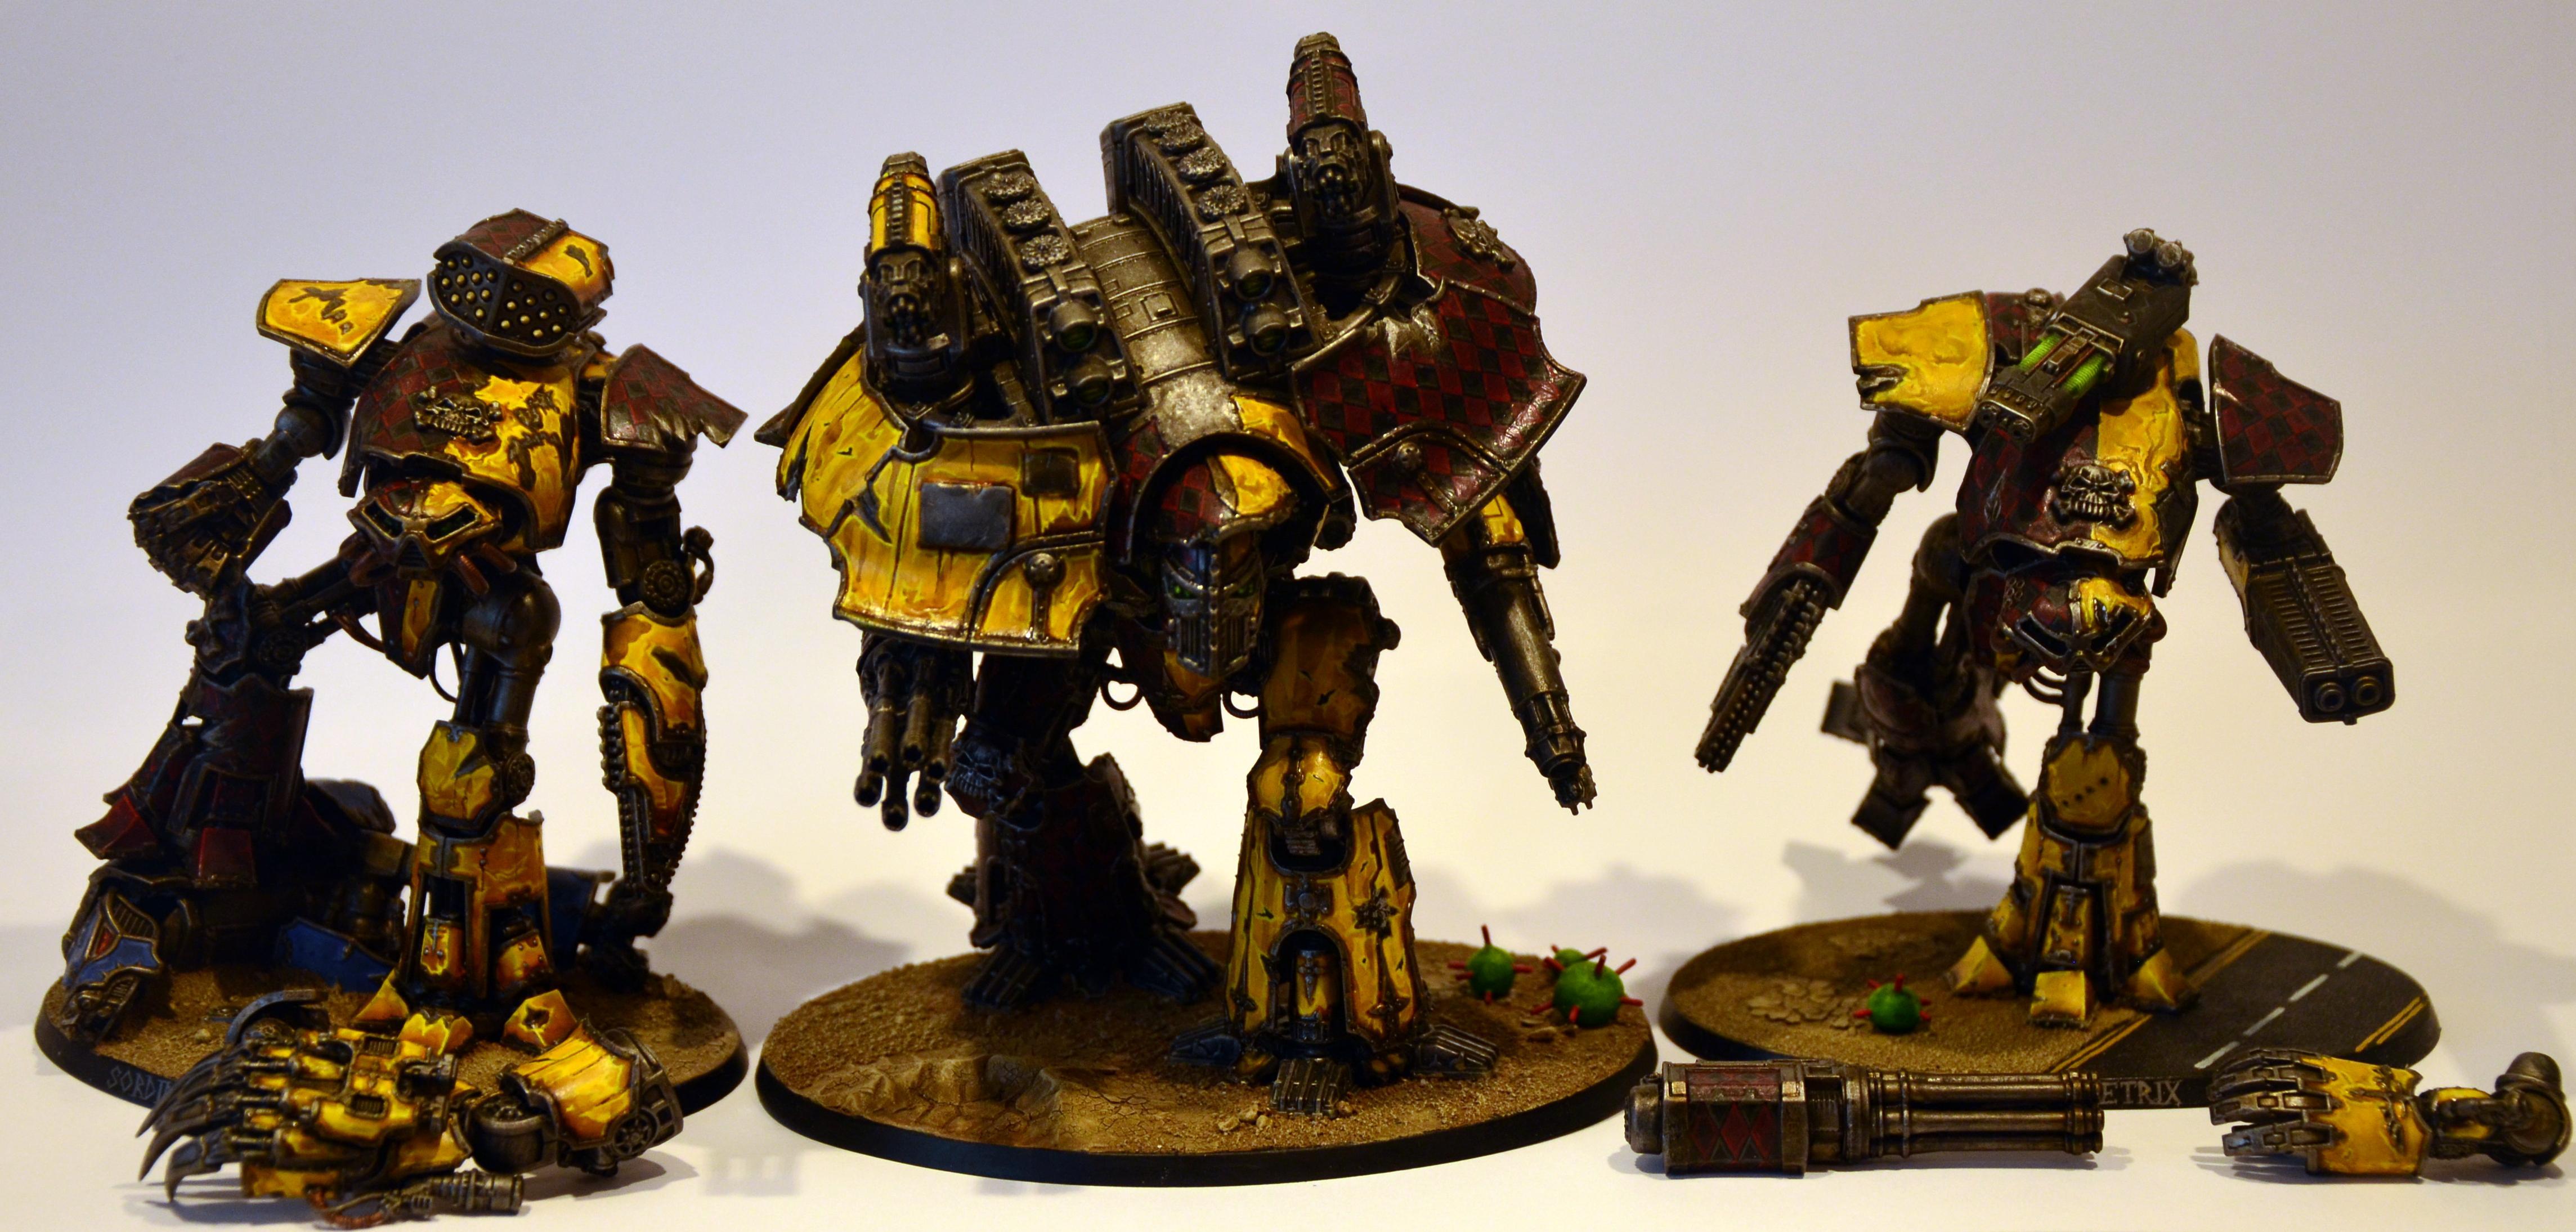 Adeptus Titanicus, Reaver, Titan, Warhammer 40,000, Warlord